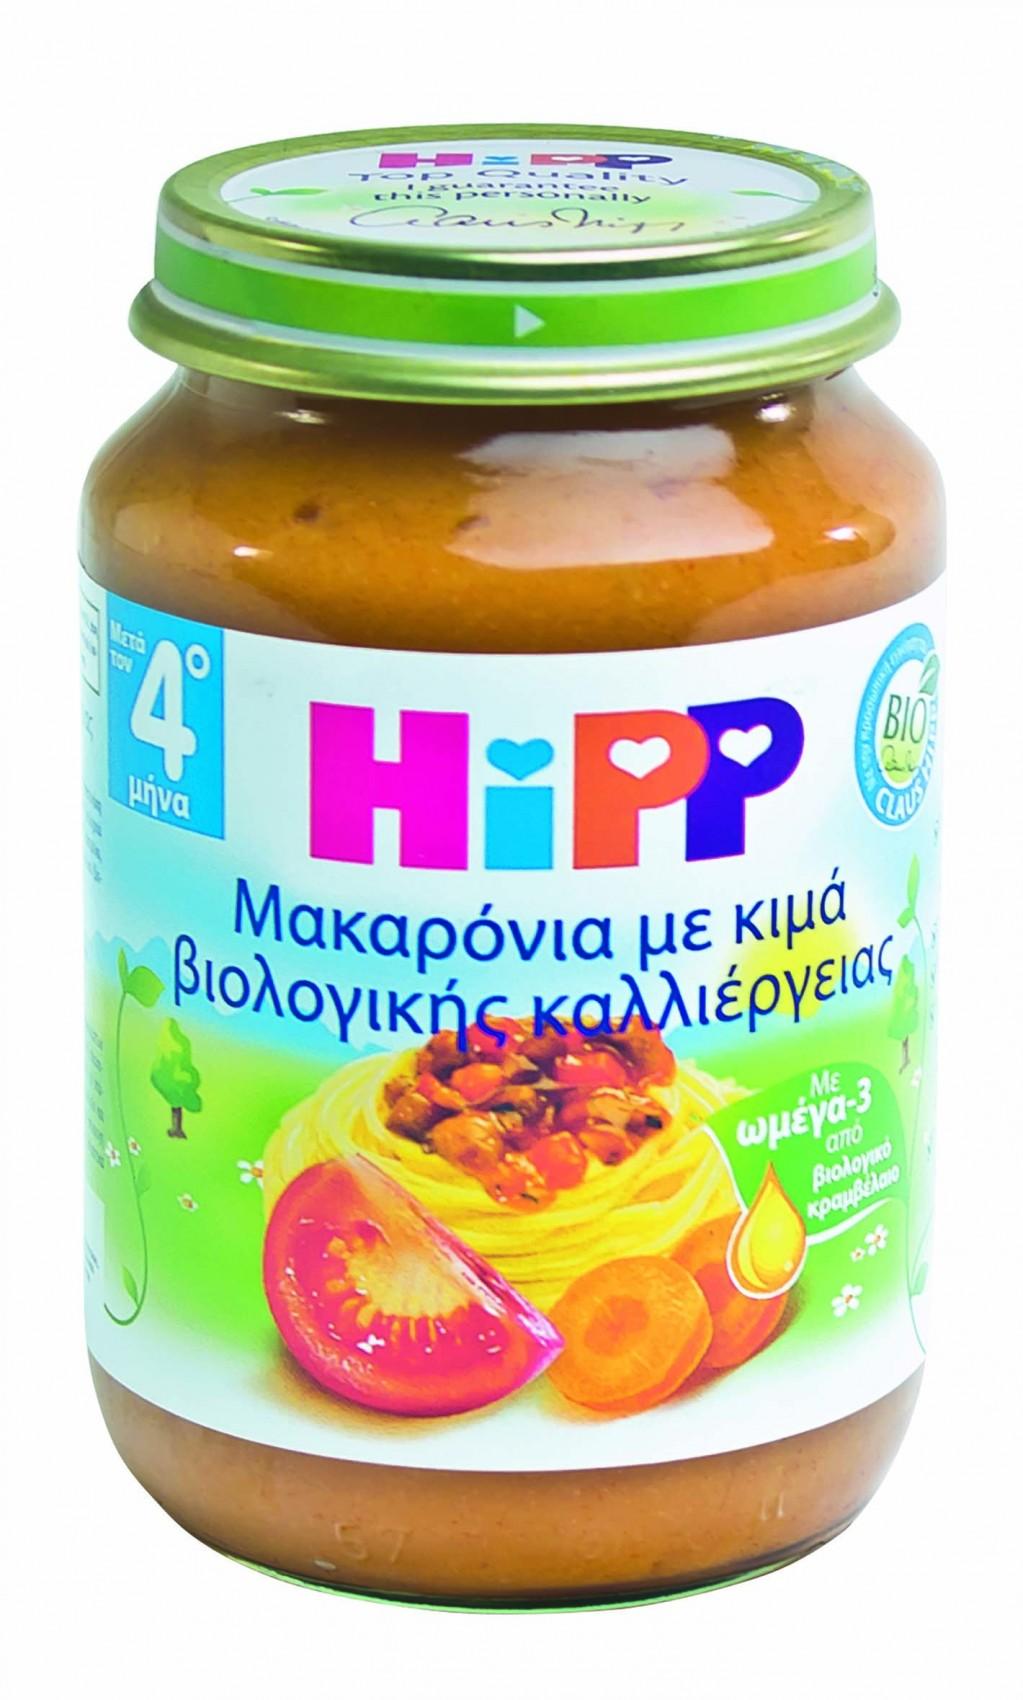 Hipp - Γέυμα μακαρόνια με κιμά και φρέσκια τομάτα 190gr